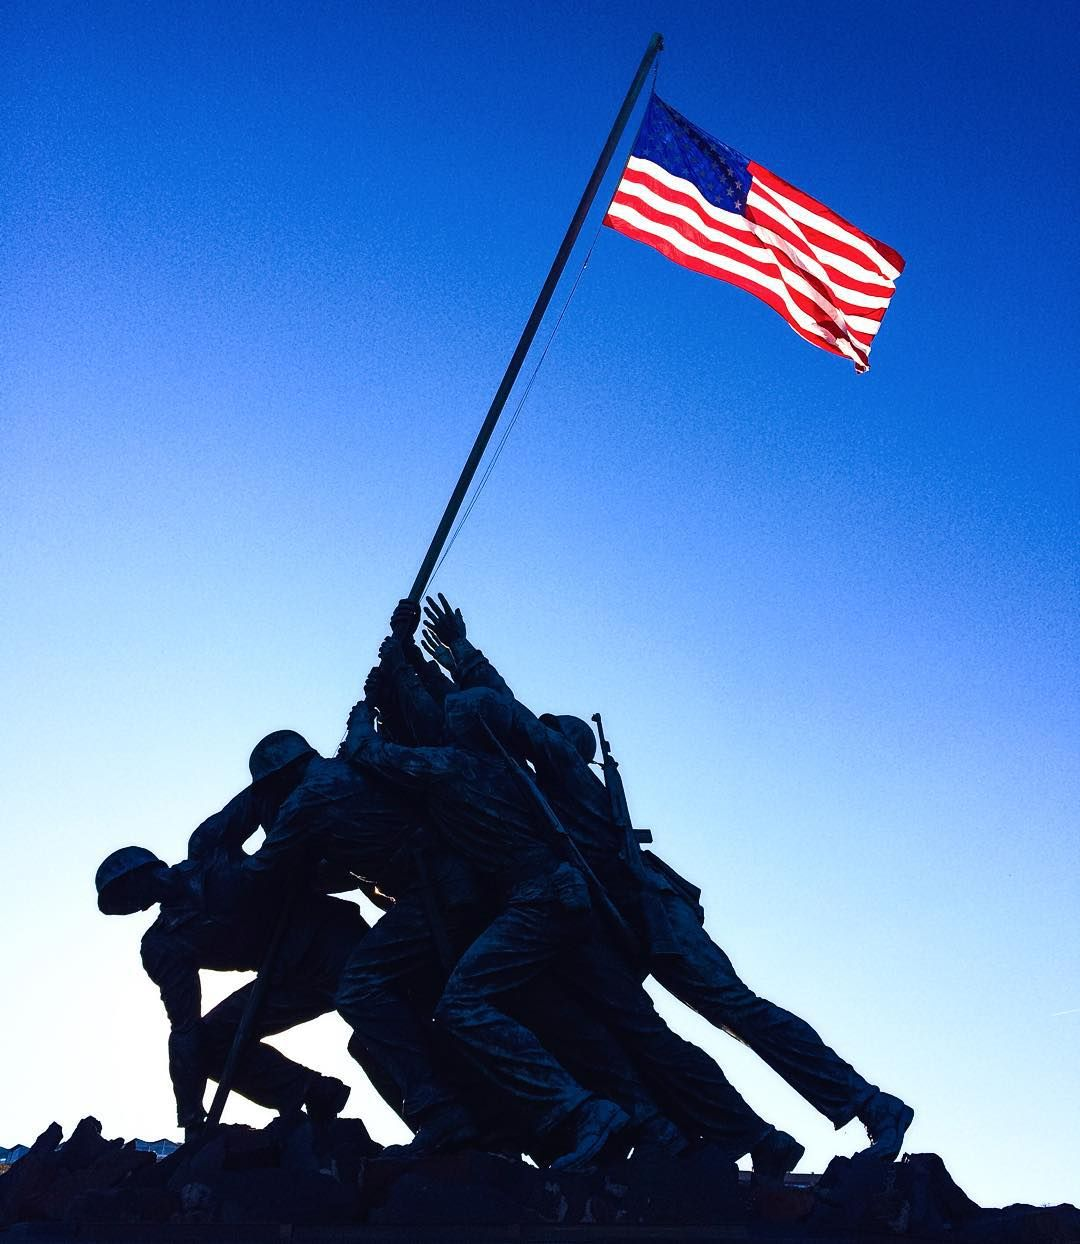 Roller skating rink arlington va - The Iwo Jima Memorial In Arlington Virginia Is So Powerful Those Hands